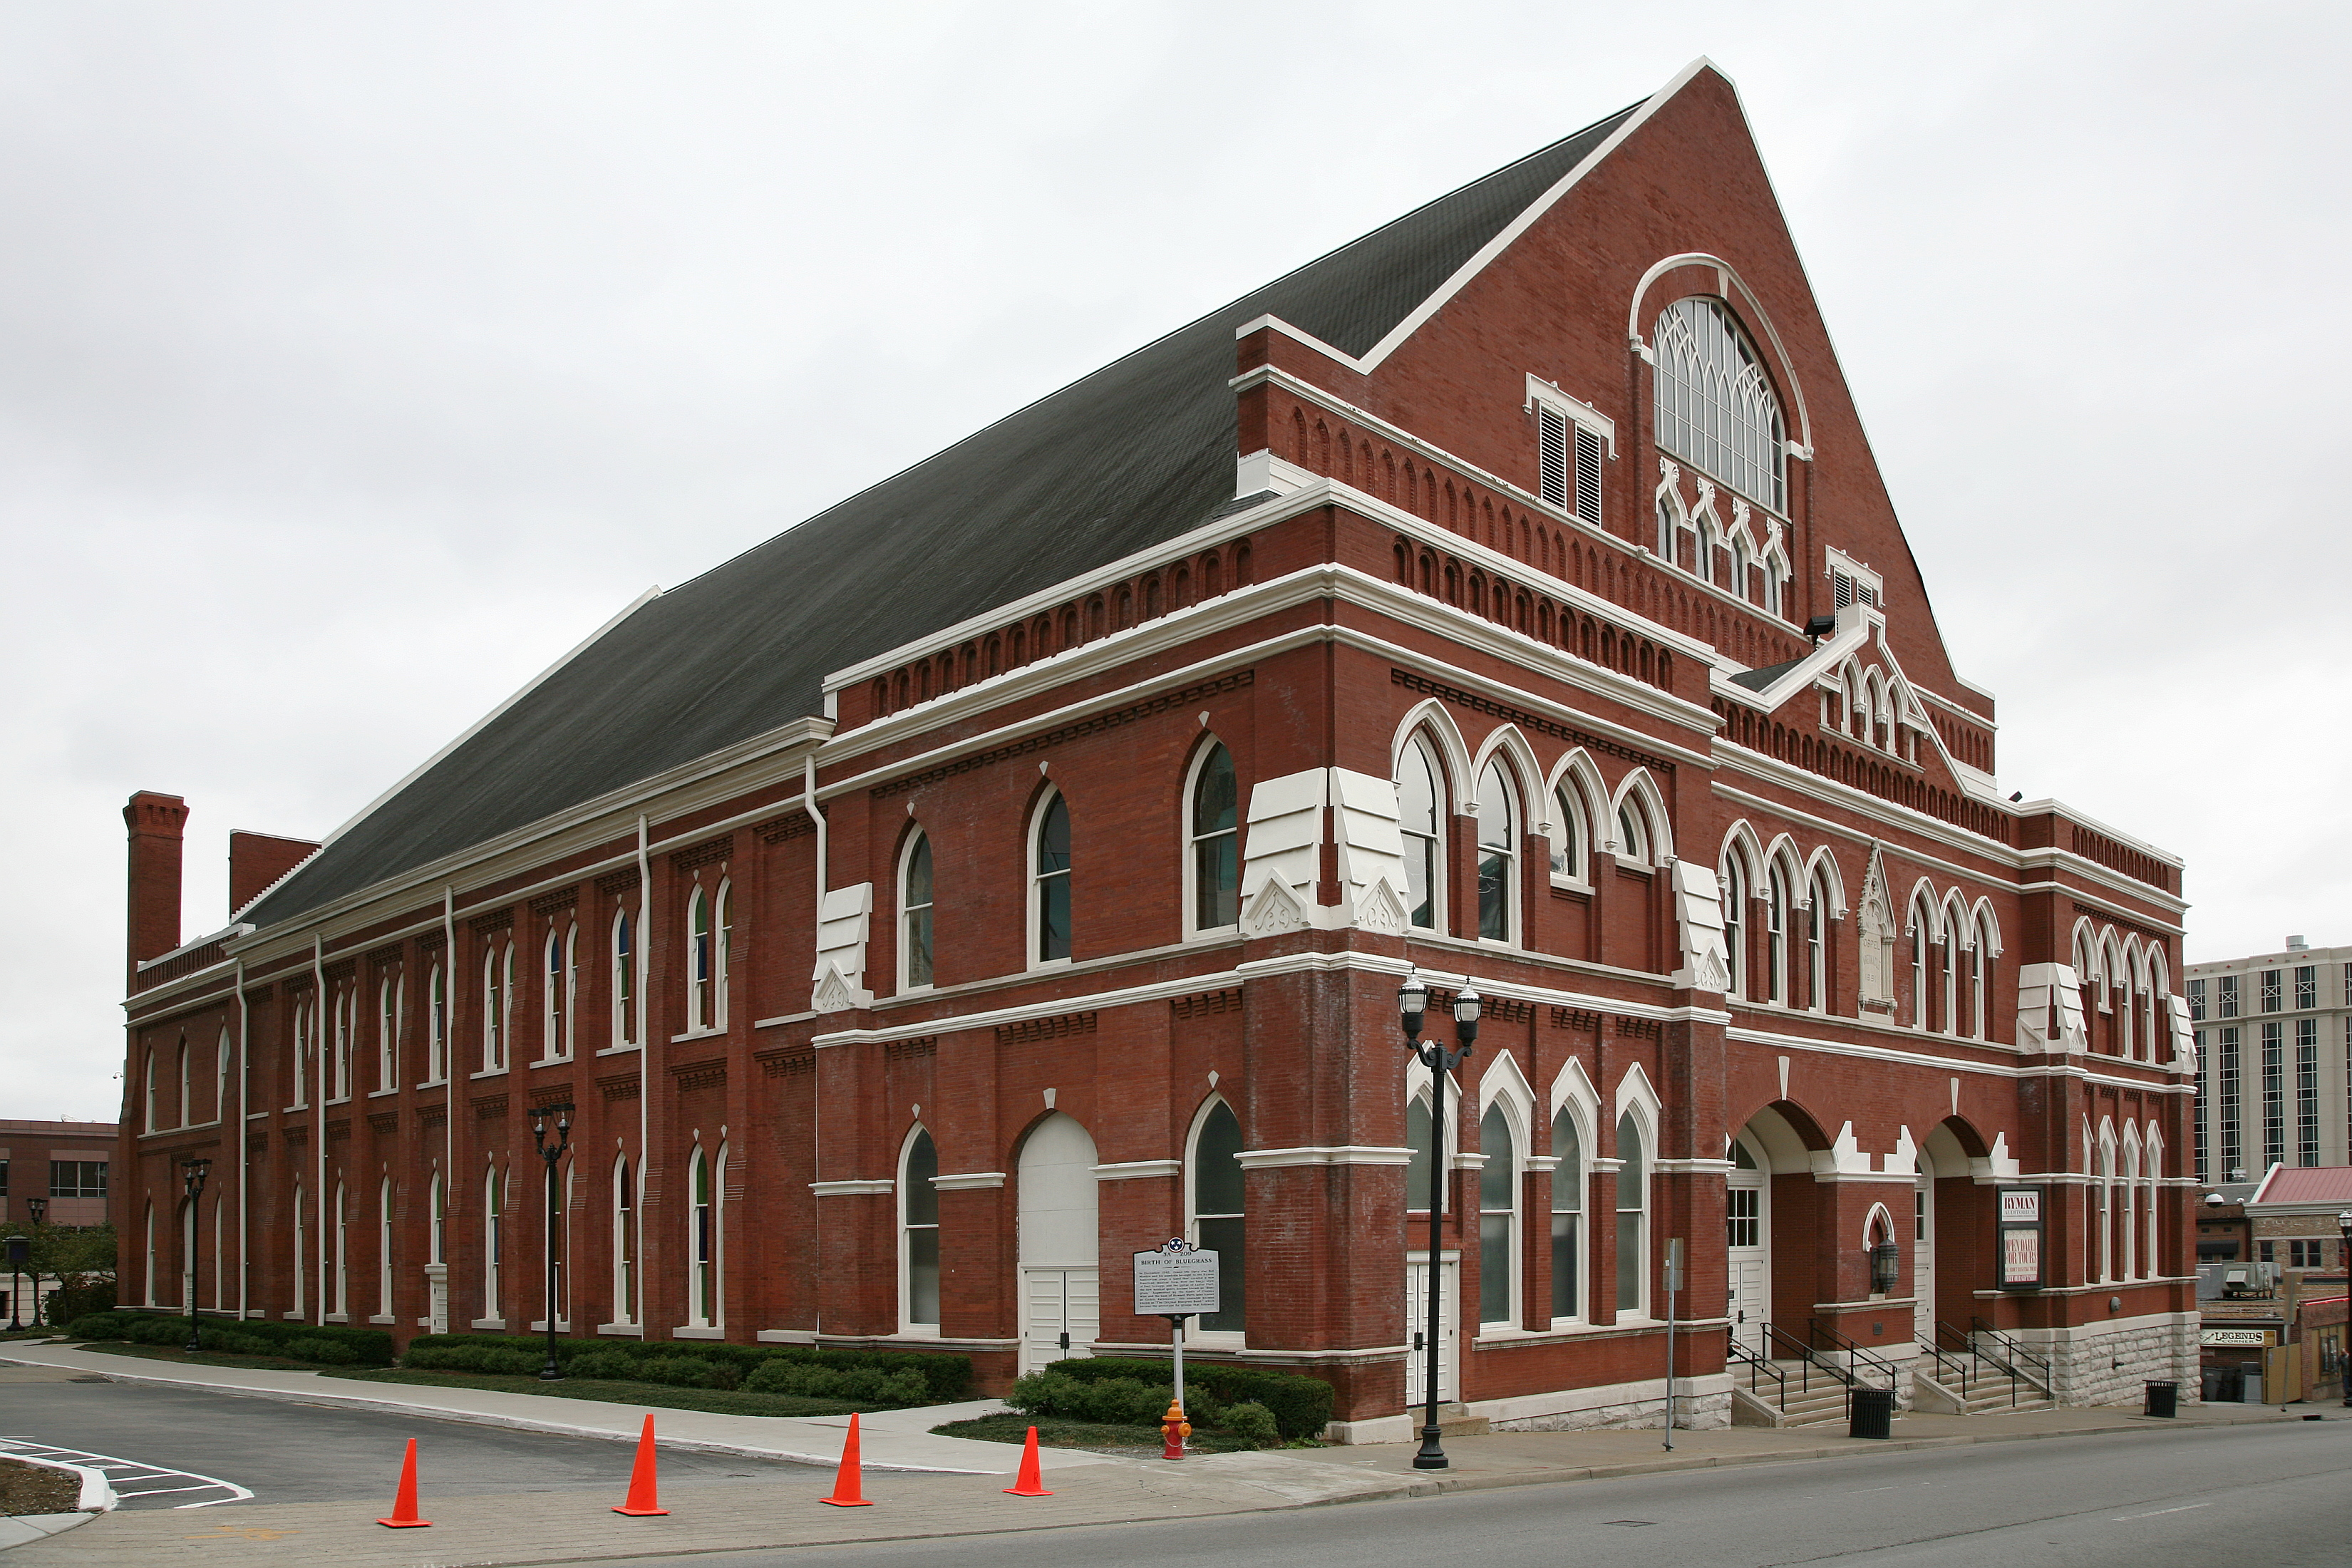 Ryman Auditorium, facing Nashville's Fifth Avenue North. Photo taken on November 22, 2007.